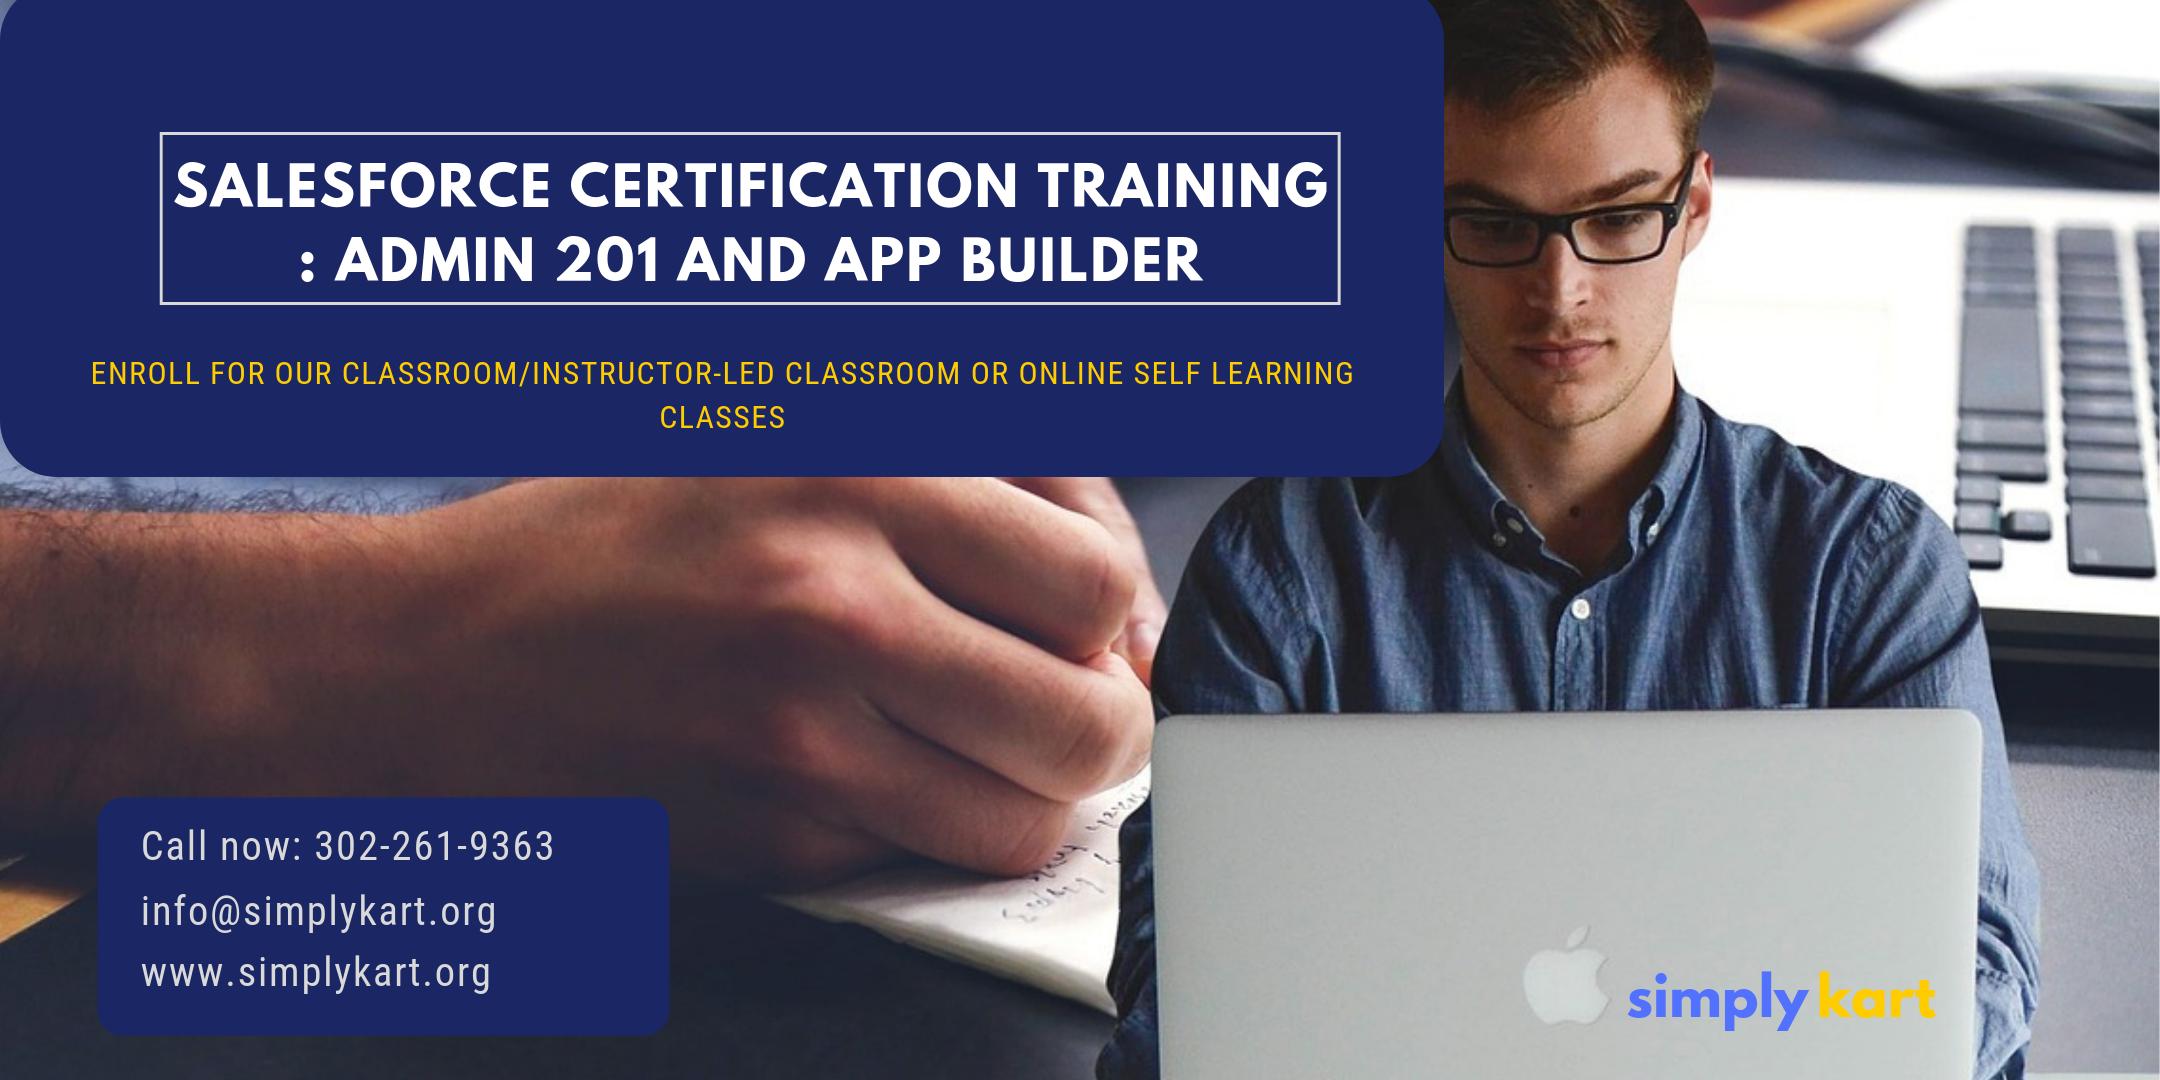 salesforce certification admin builder training app va richmond wayne fort eventbrite events calls casting published business